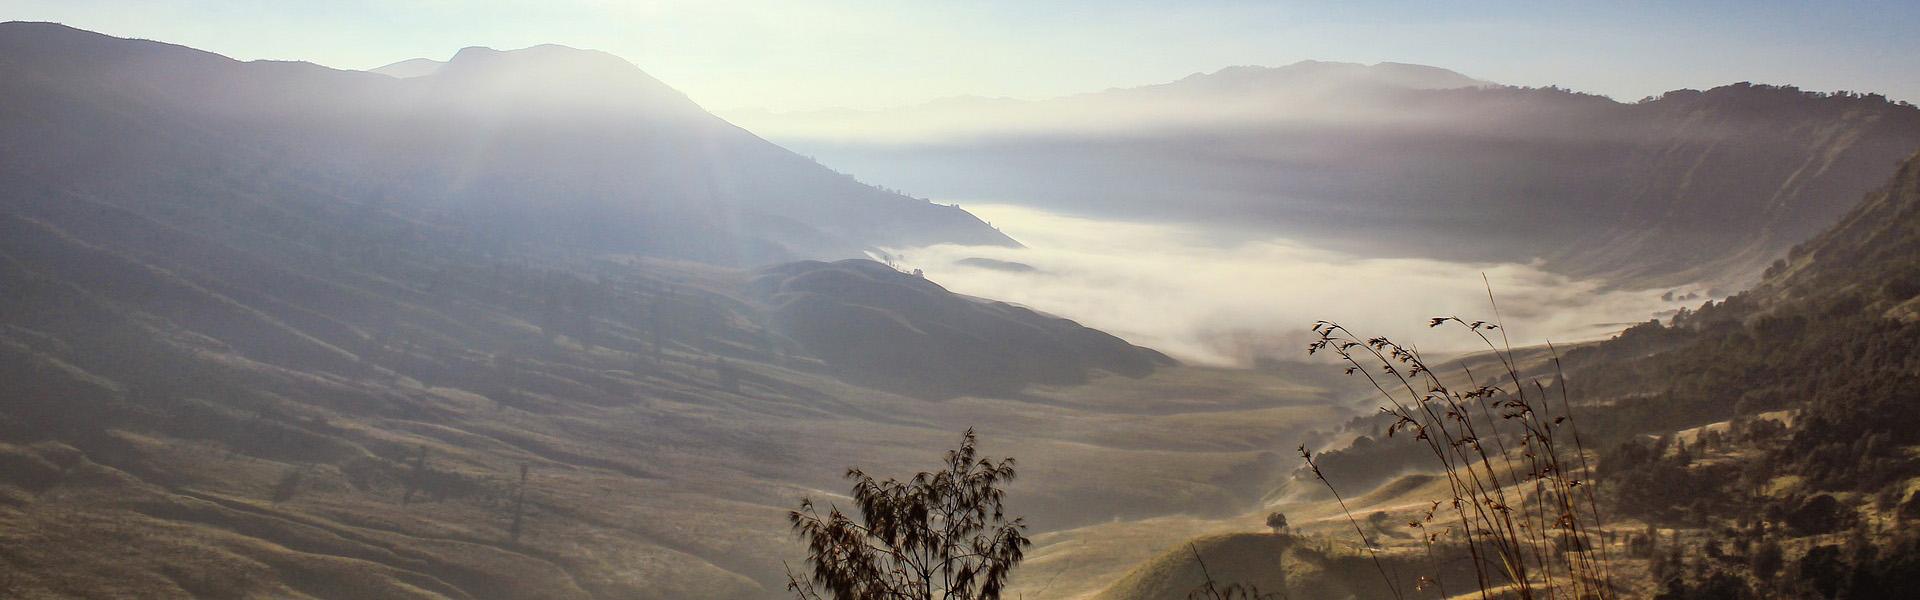 Misty morning over Bromo Tengger Semeru National Park, Java